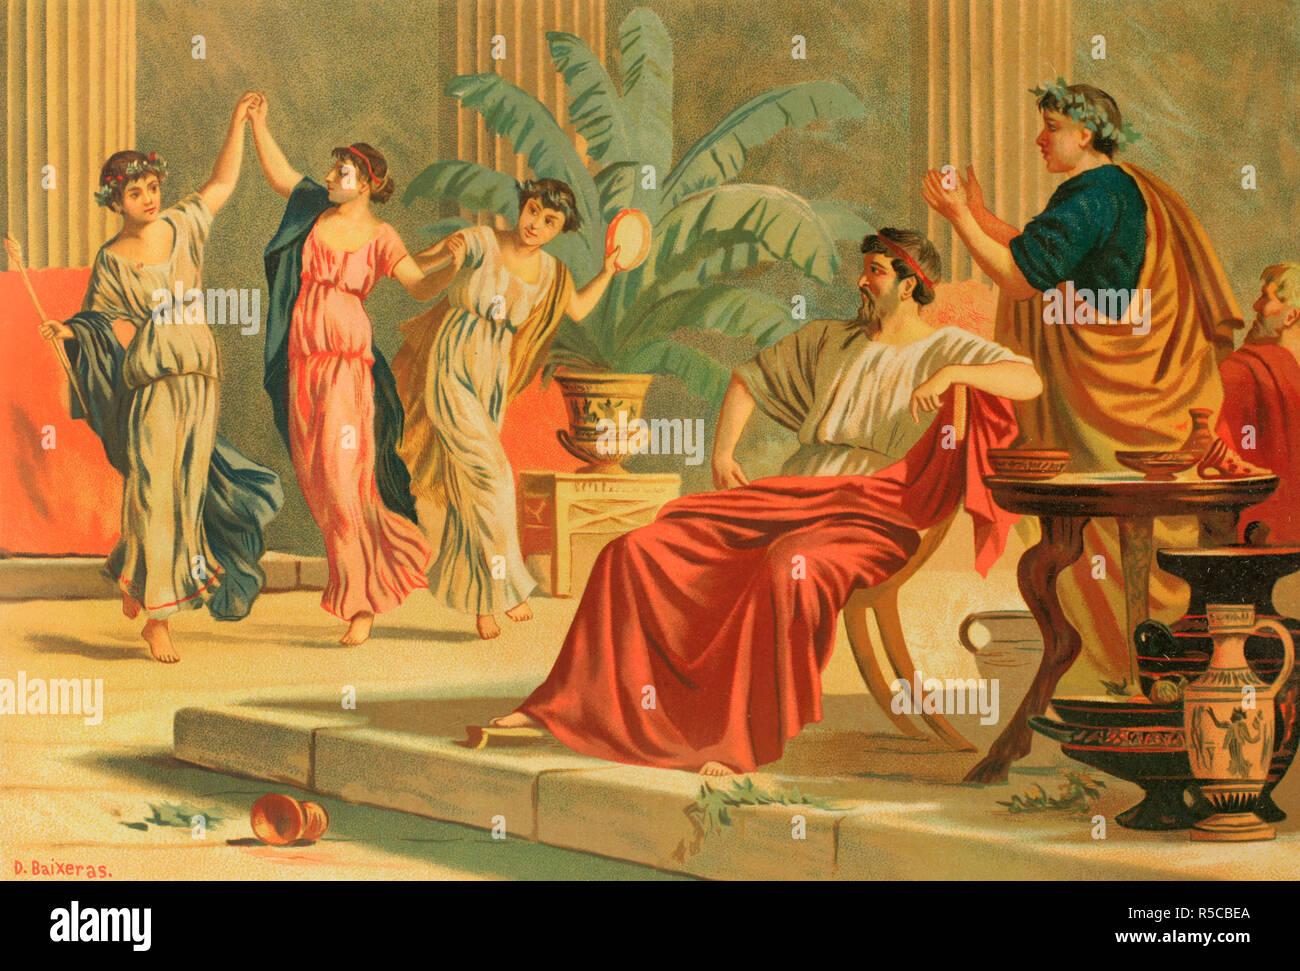 Ancient Greece. Dances after a banquet or simposium. Drawing by Dionisio Baixeras (1862-1943). Chromolithography. La Civilizacion (The Civilization), volume II, 1881. Stock Photo